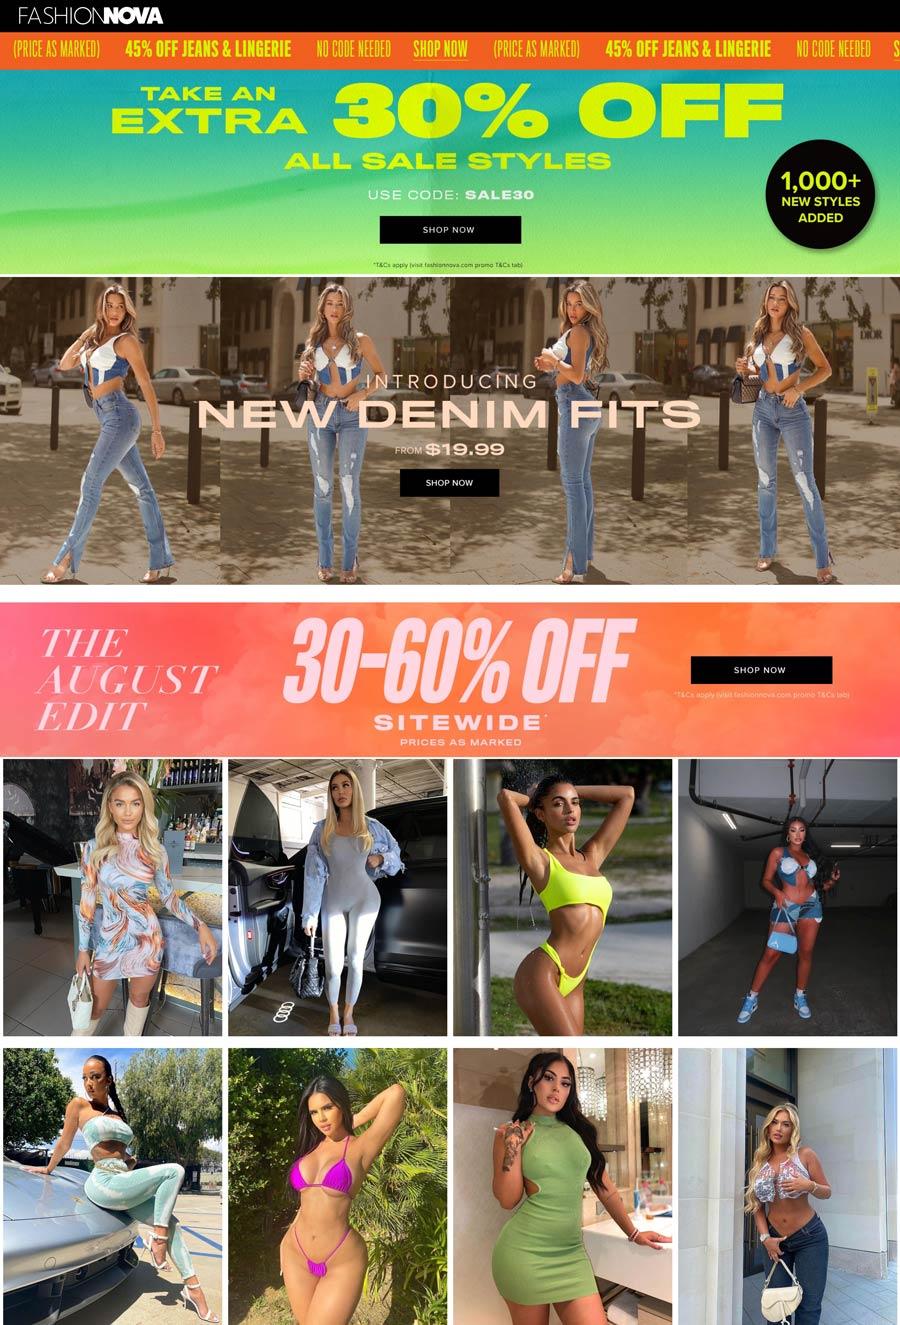 Fashion Nova stores Coupon  Extra 30% off sale styles & 30-60% off everything at Fashion Nova via promo code SALE30 #fashionnova